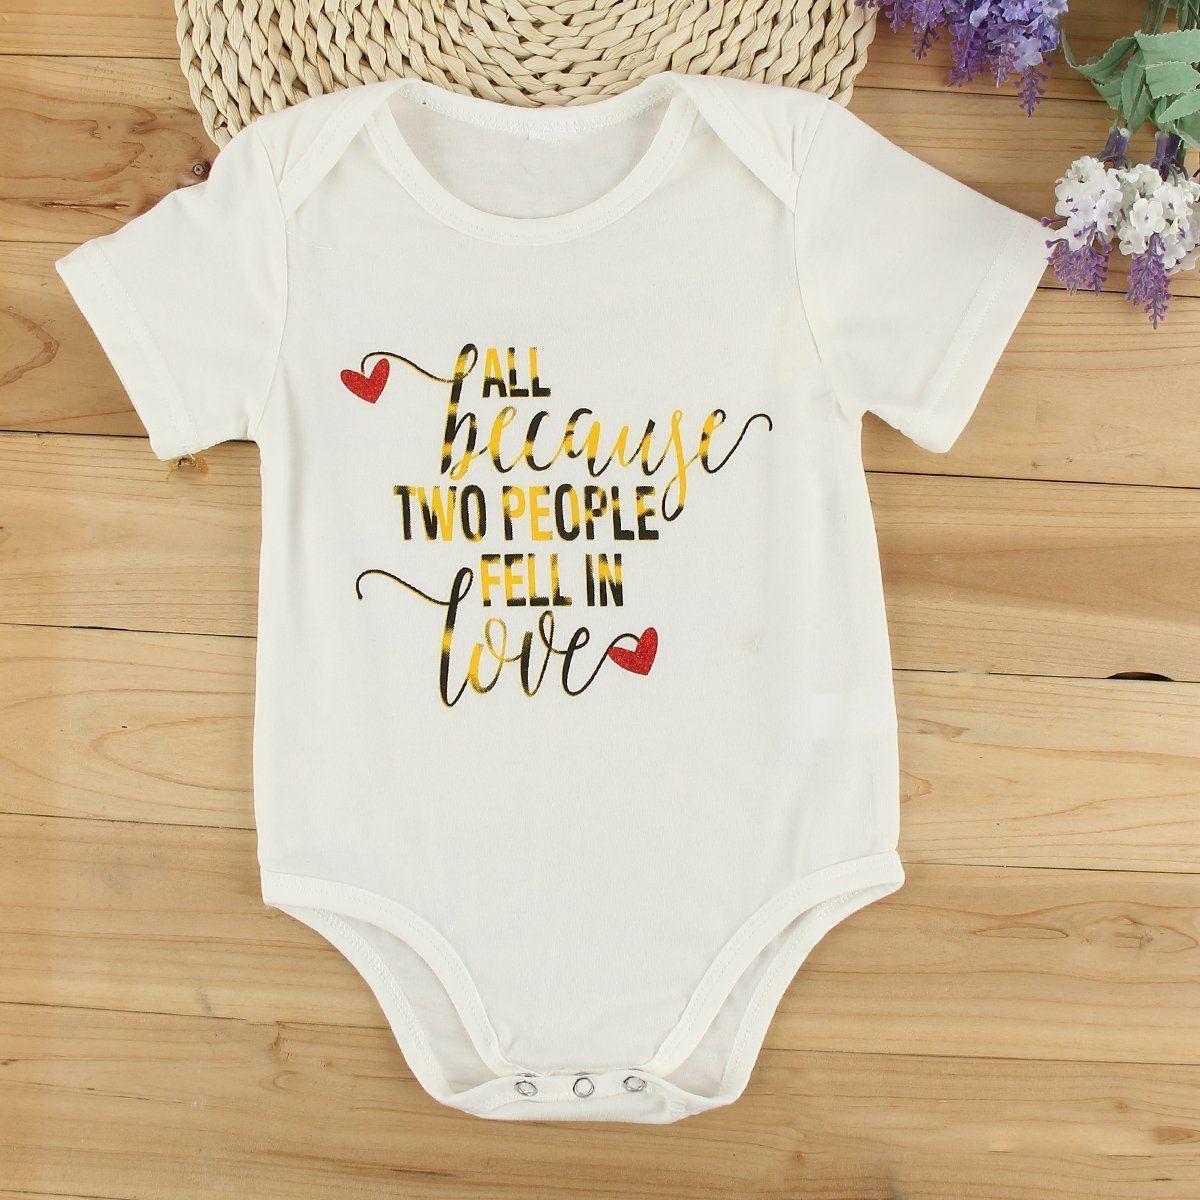 17742bfac684 Cottonborn Infant Baby Boy Girls Bodysuit Romper Jumpsuit Clothes Outfits